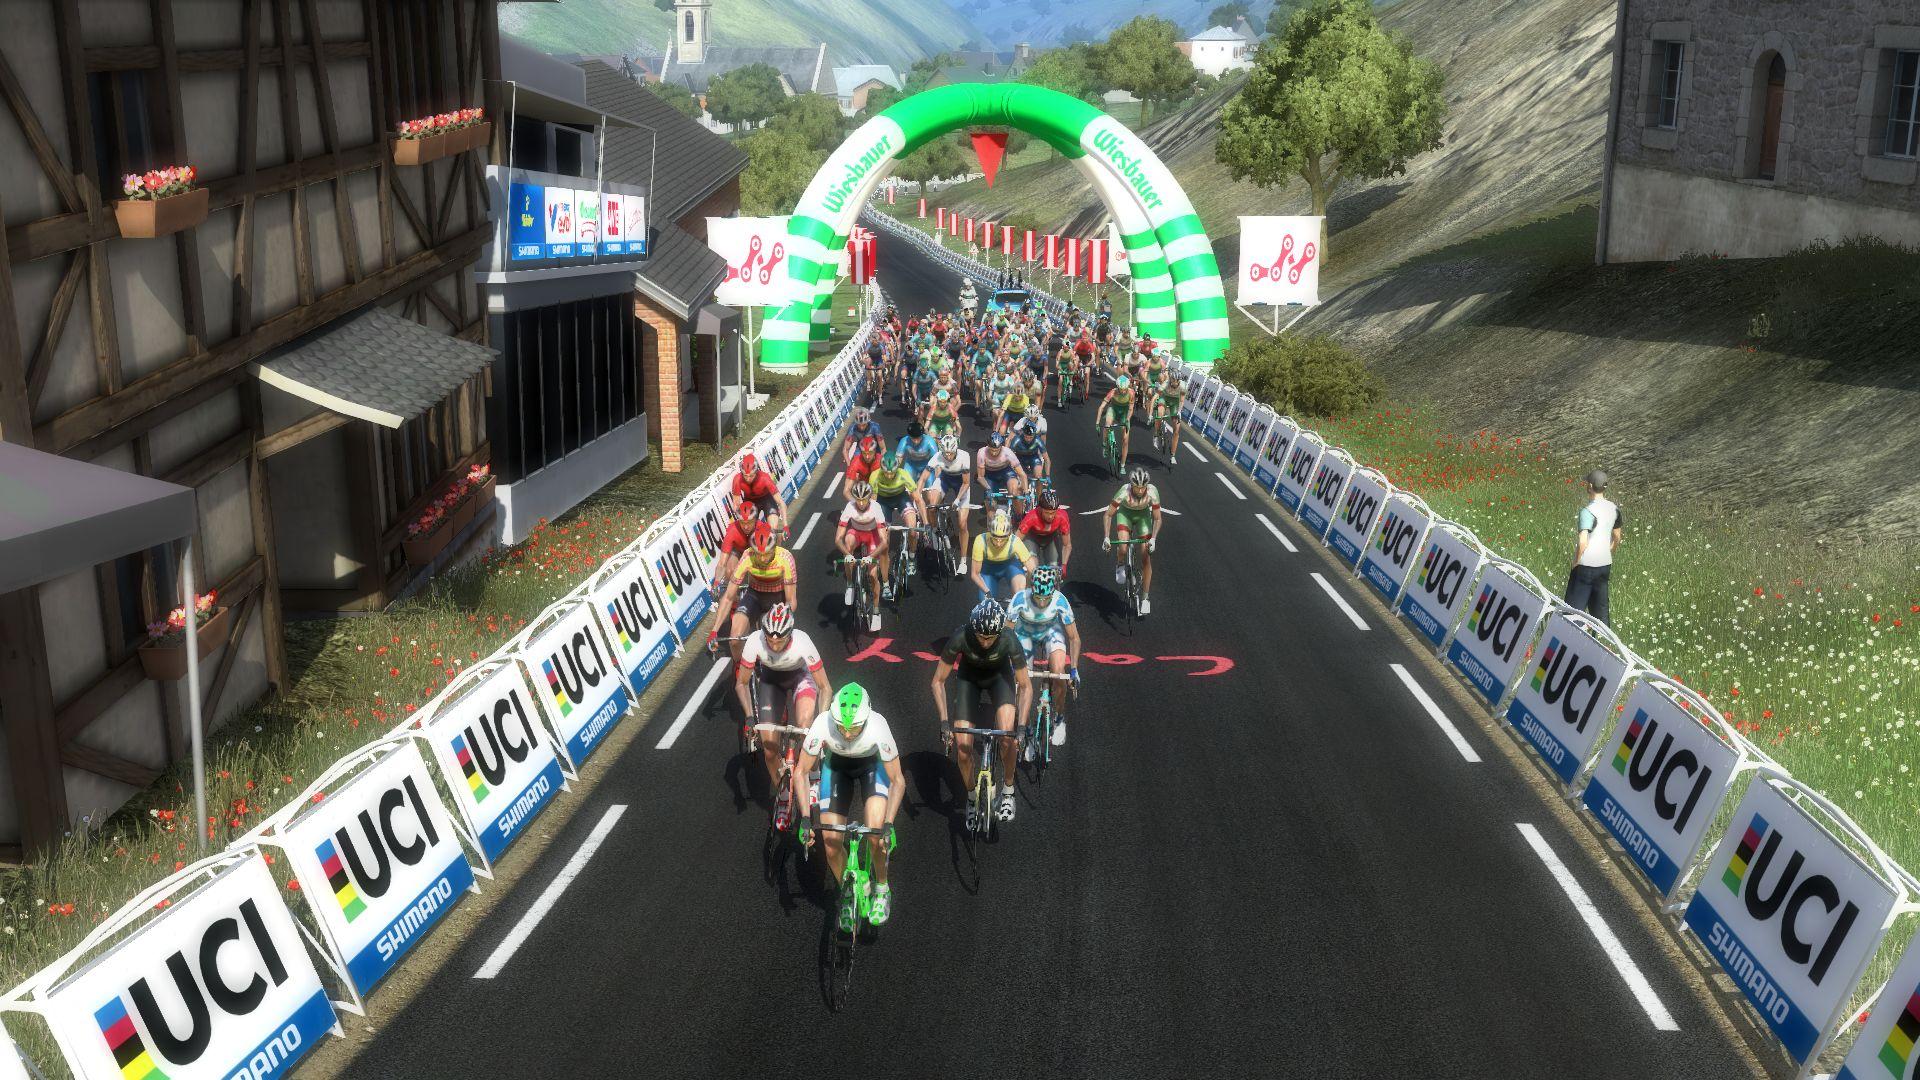 pcmdaily.com/images/mg/2020/Reports/HC/Austria/S4/mg20_austria_s04_57.jpg